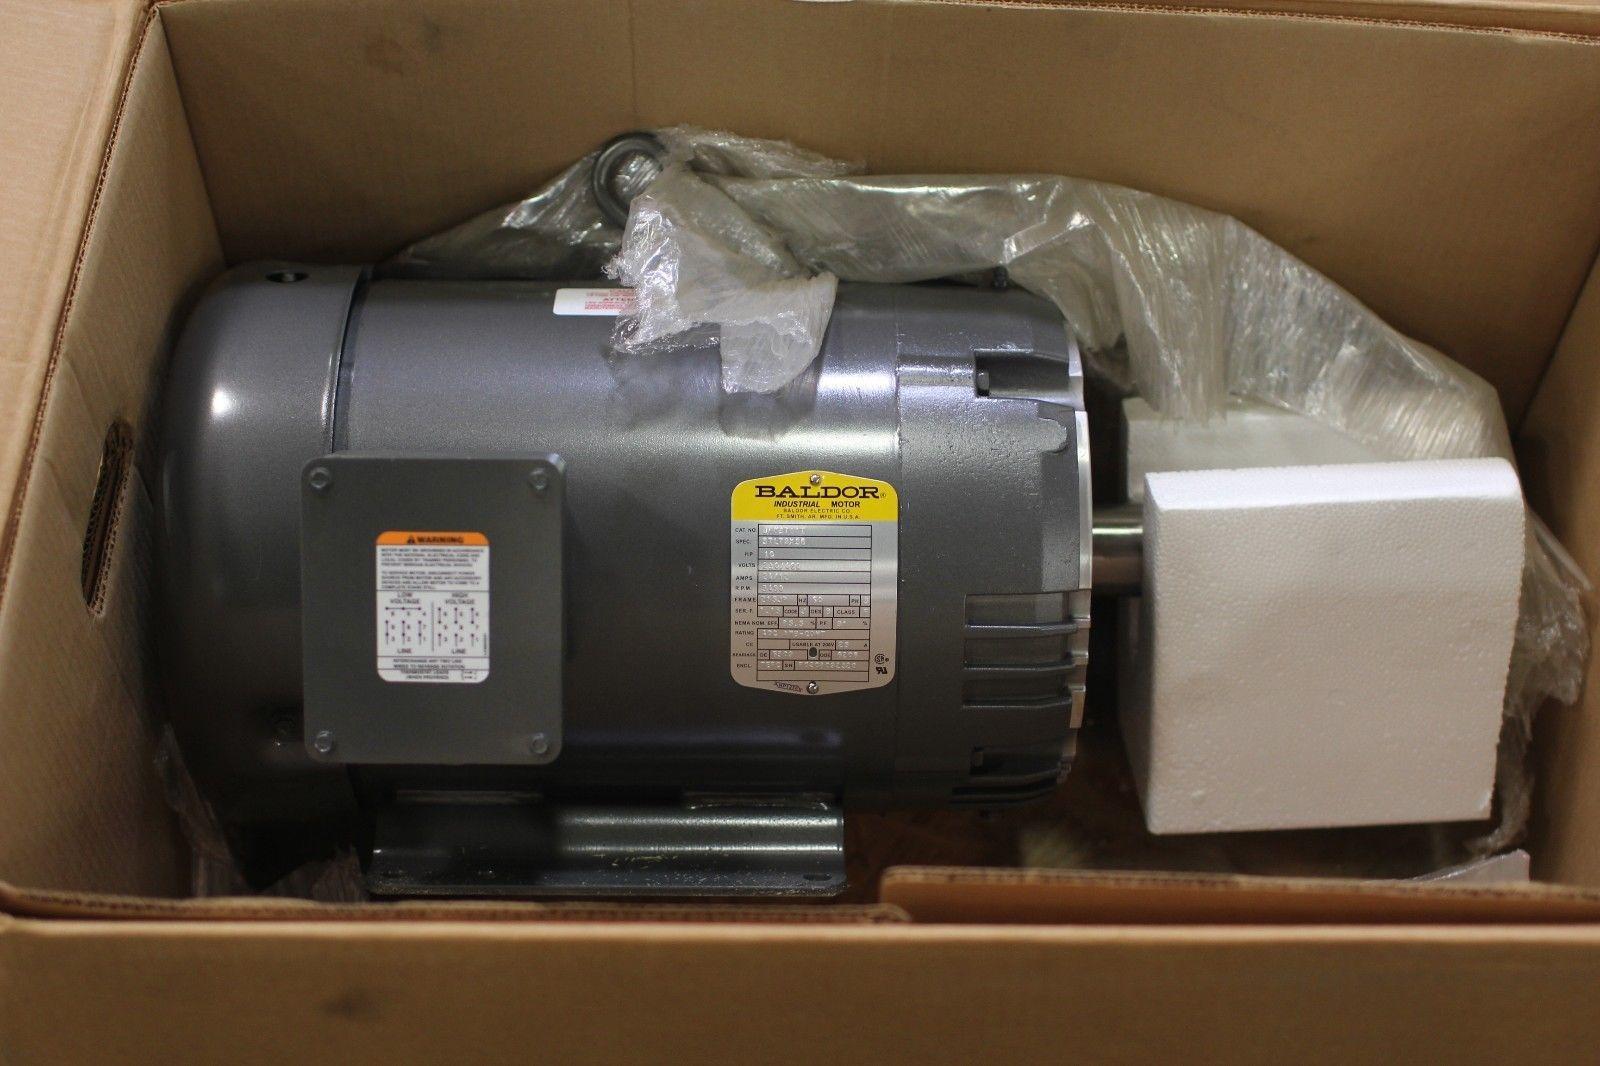 New Baldor Electric Pump Motor Jpm3711t 37l79x56 10 Hp